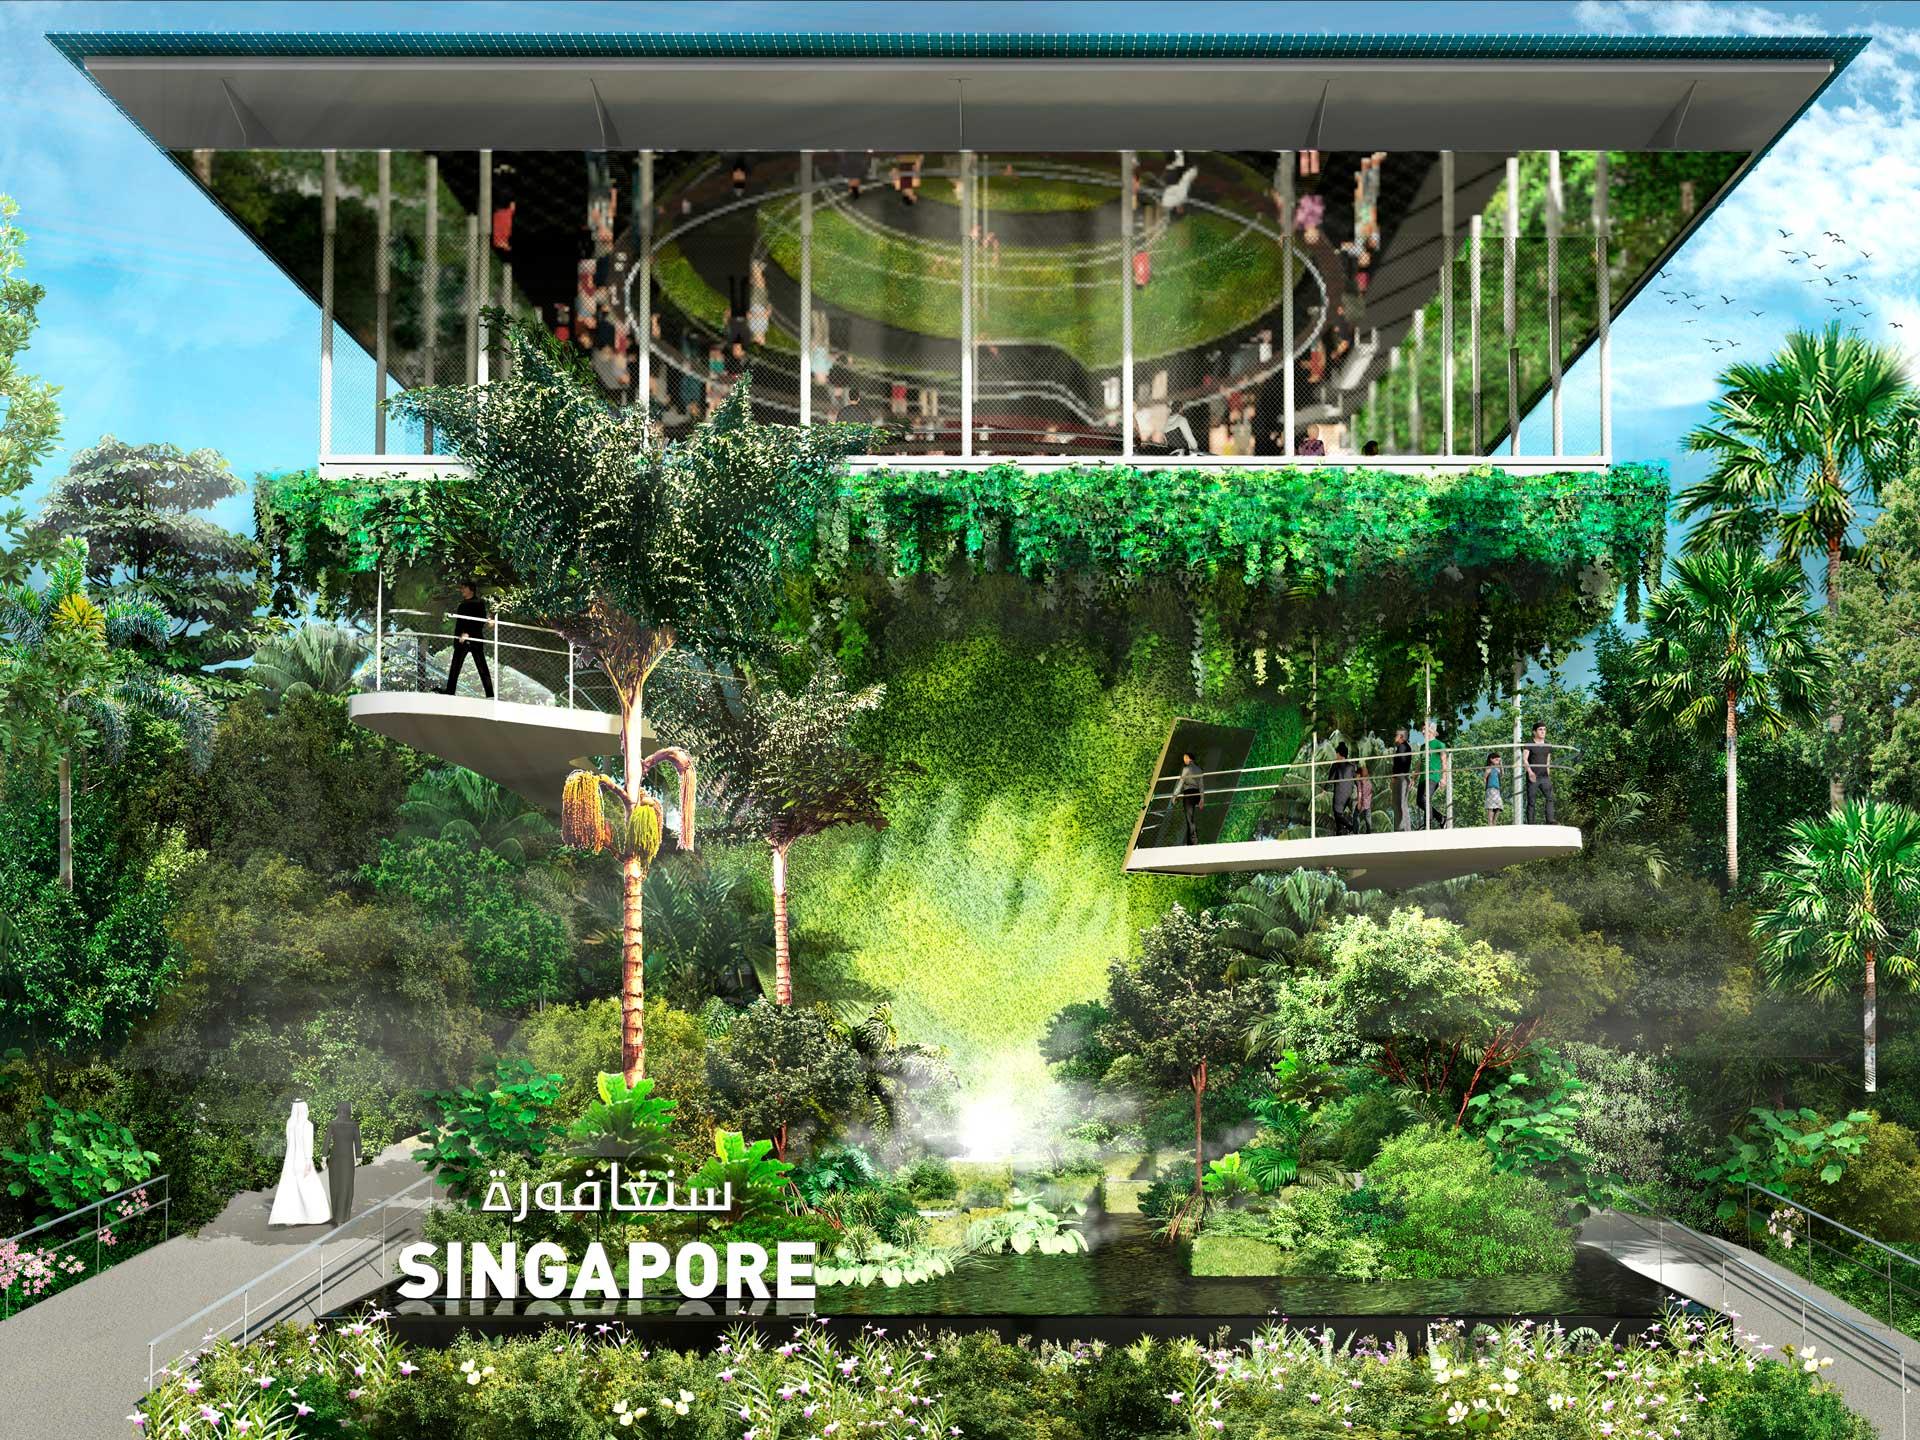 Singapore Pavilion at Expo 2021